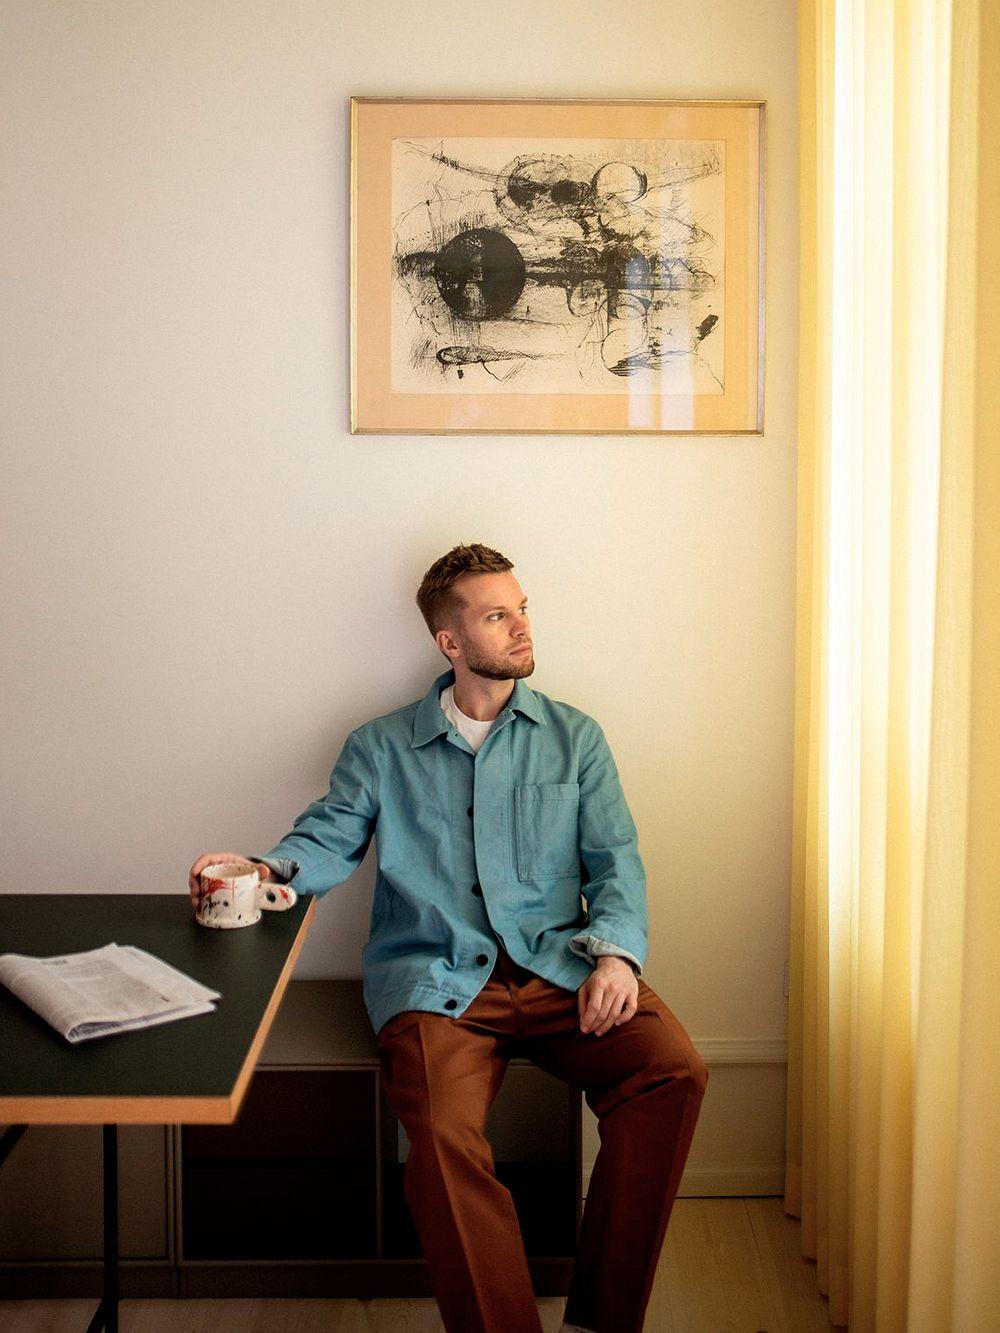 Michael Dansk Most Visual Influencer